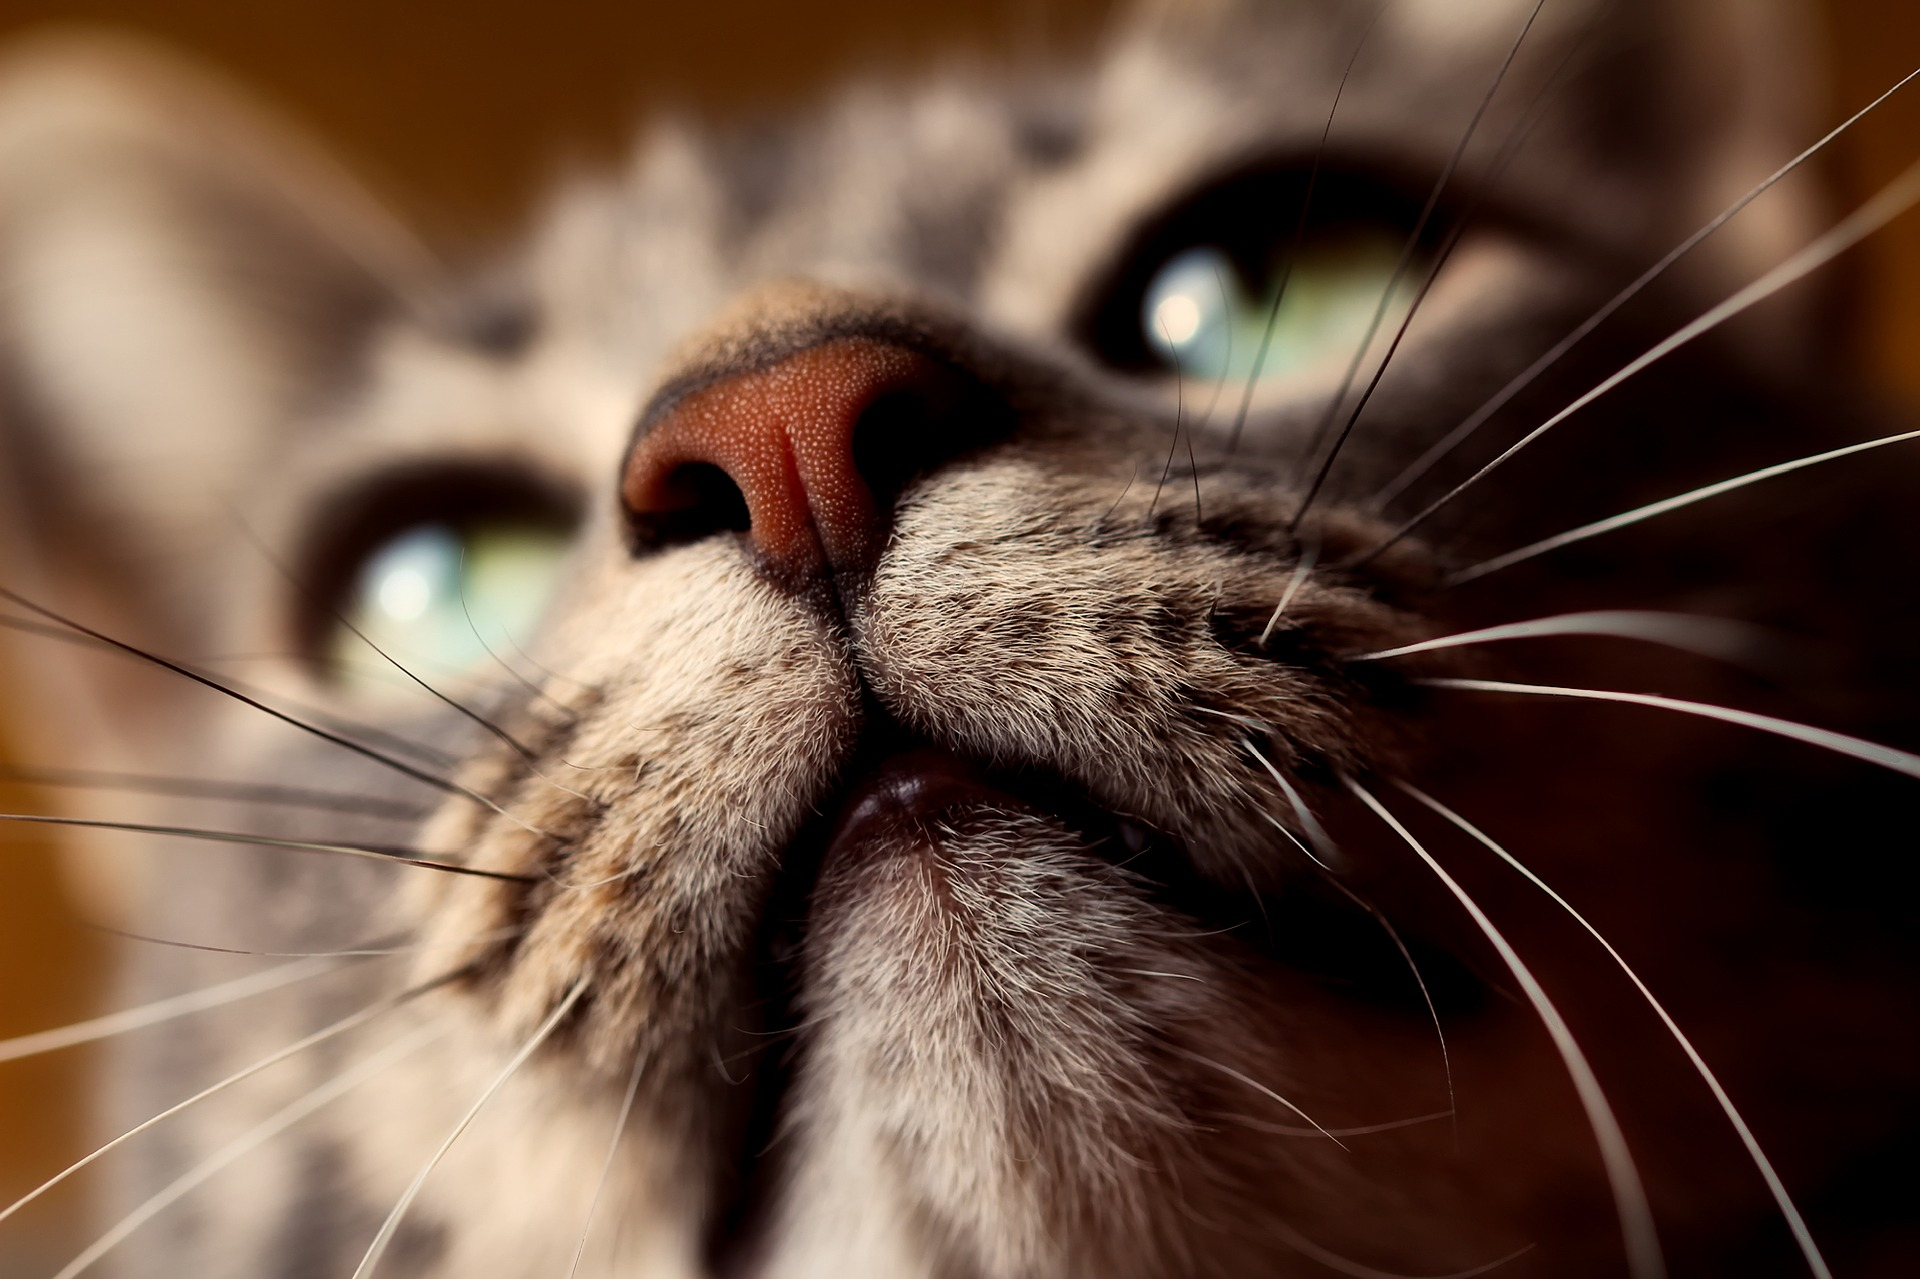 cat-2300648_1920.jpg